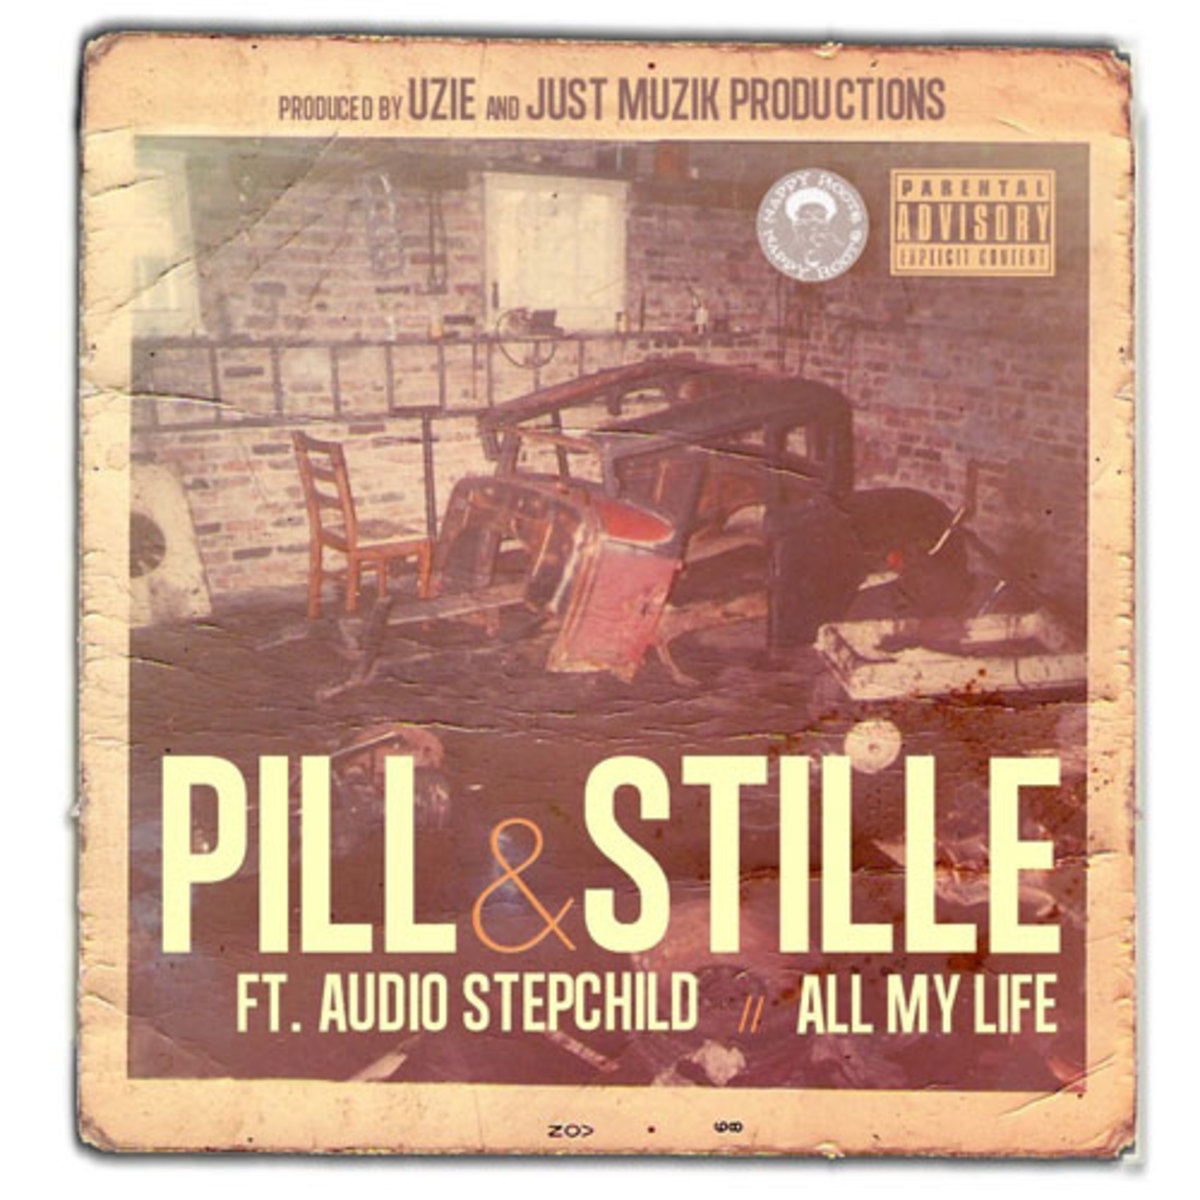 pillstille-allmylife.jpg